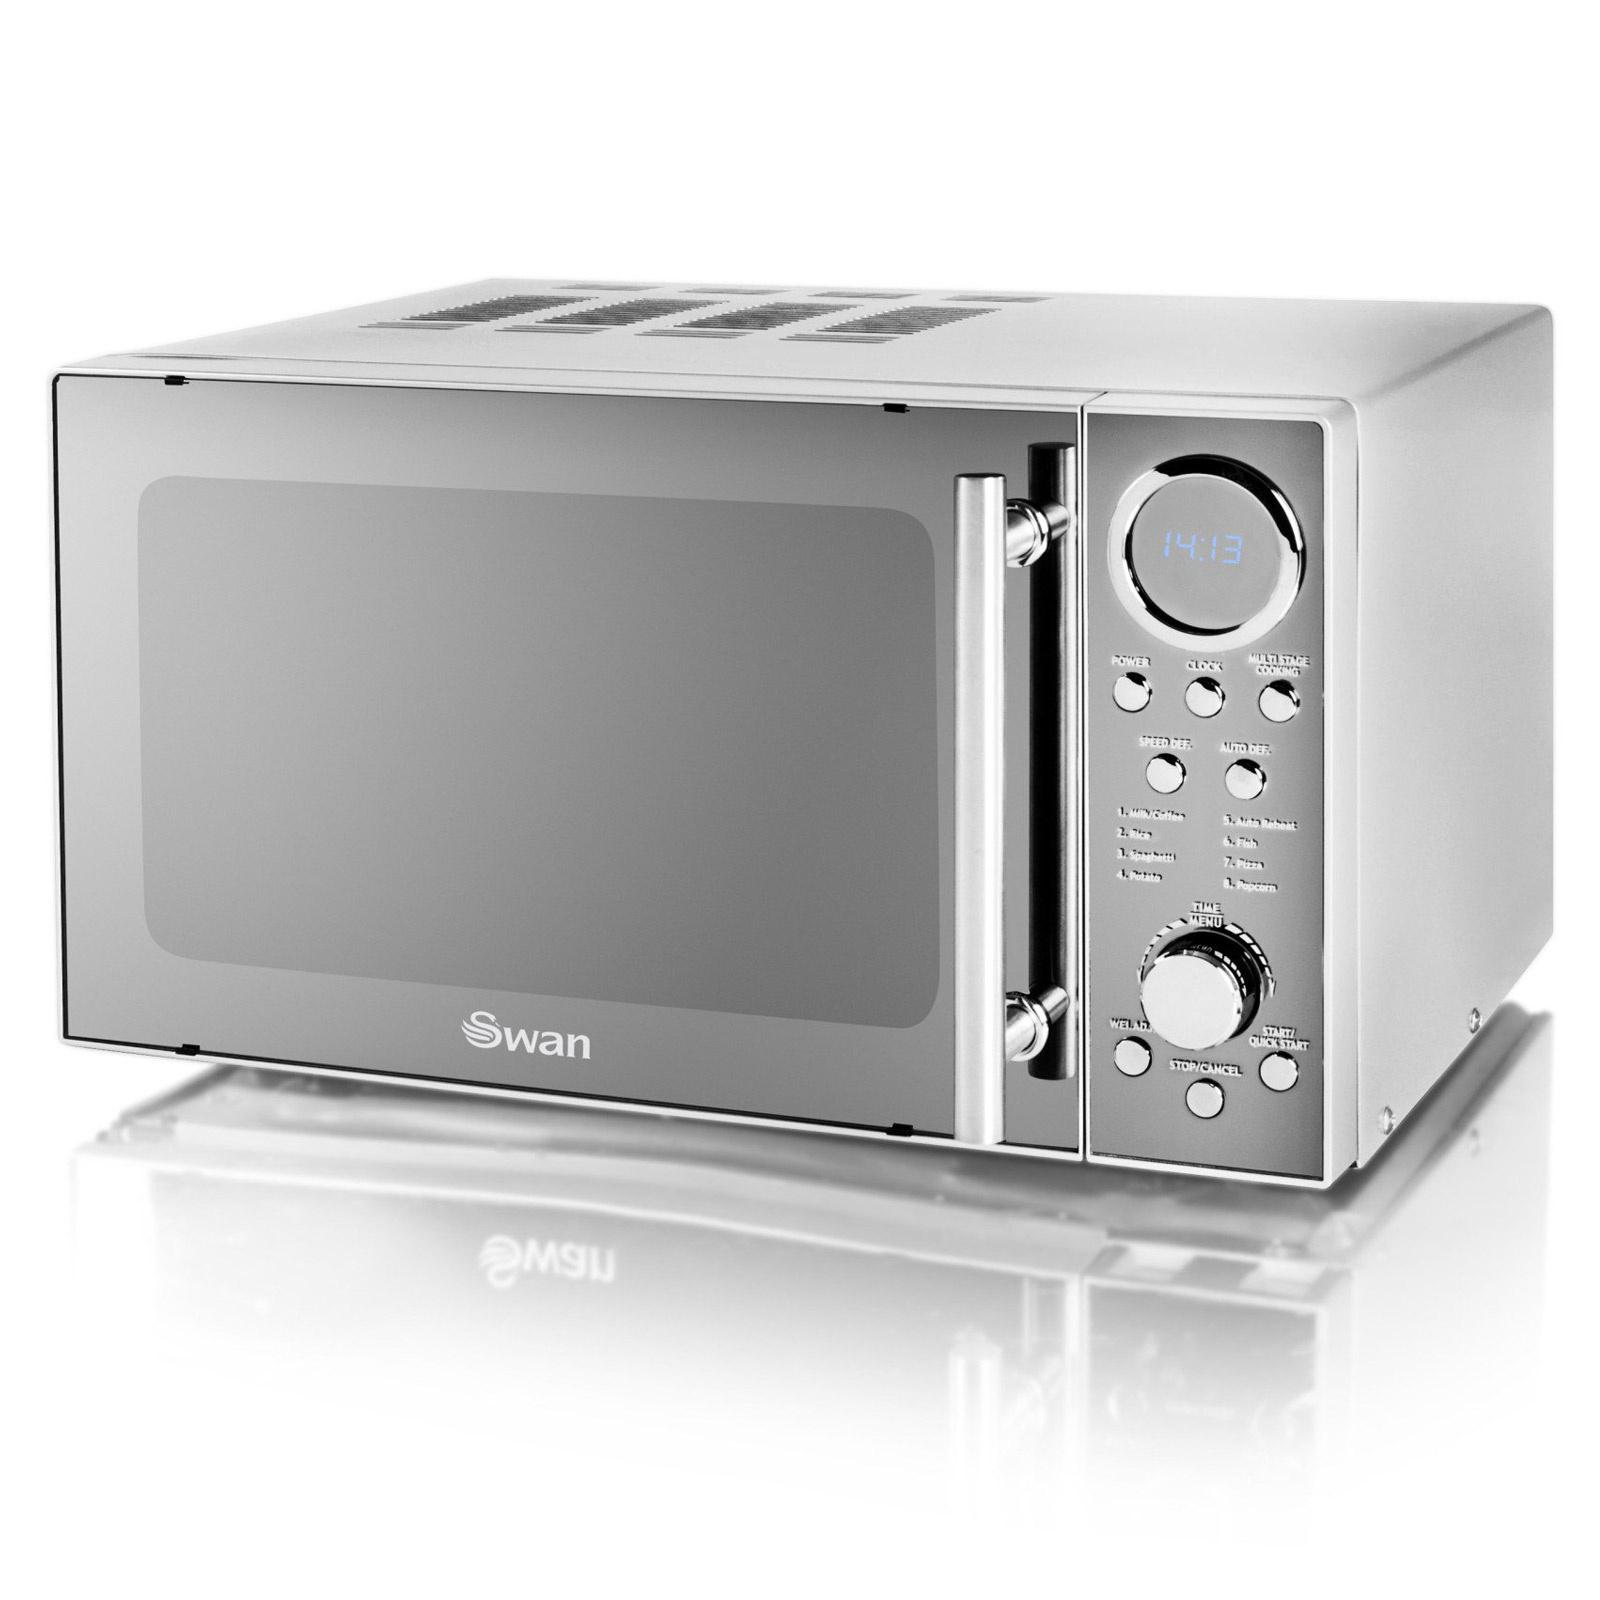 swan retro mirrored silver 800w digital microwave